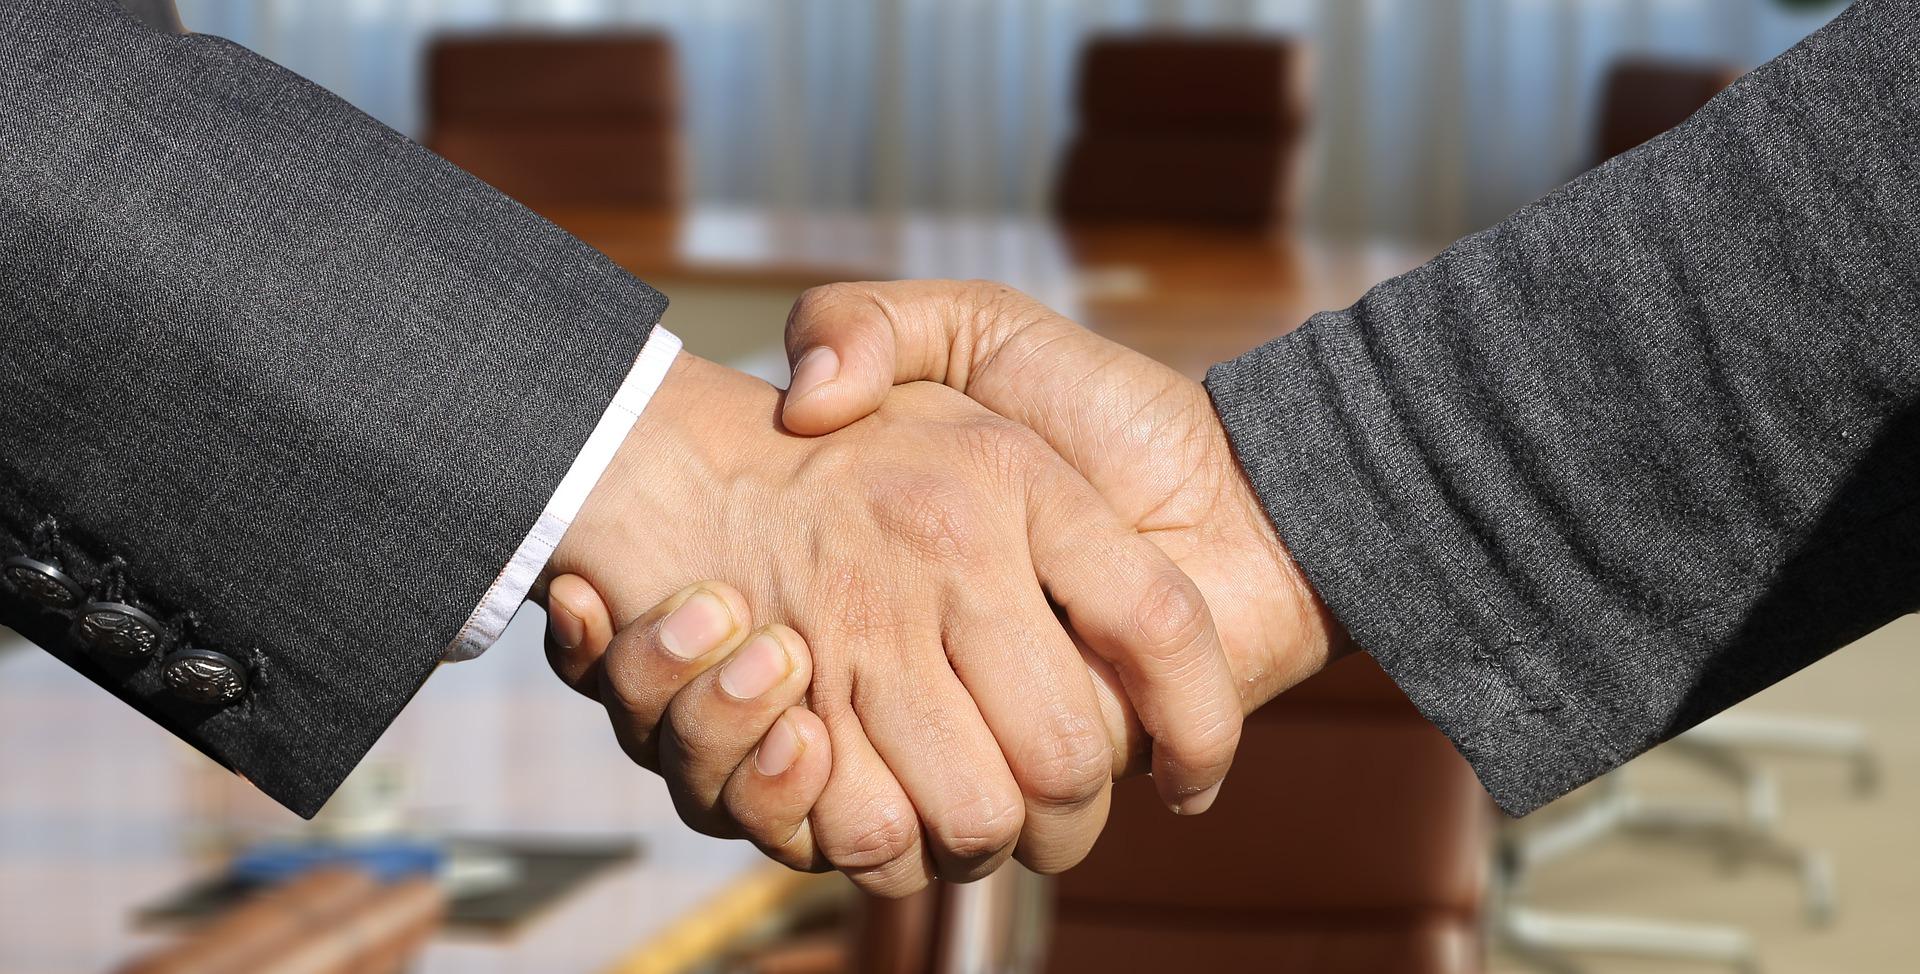 handshake - It pays off to negotiate